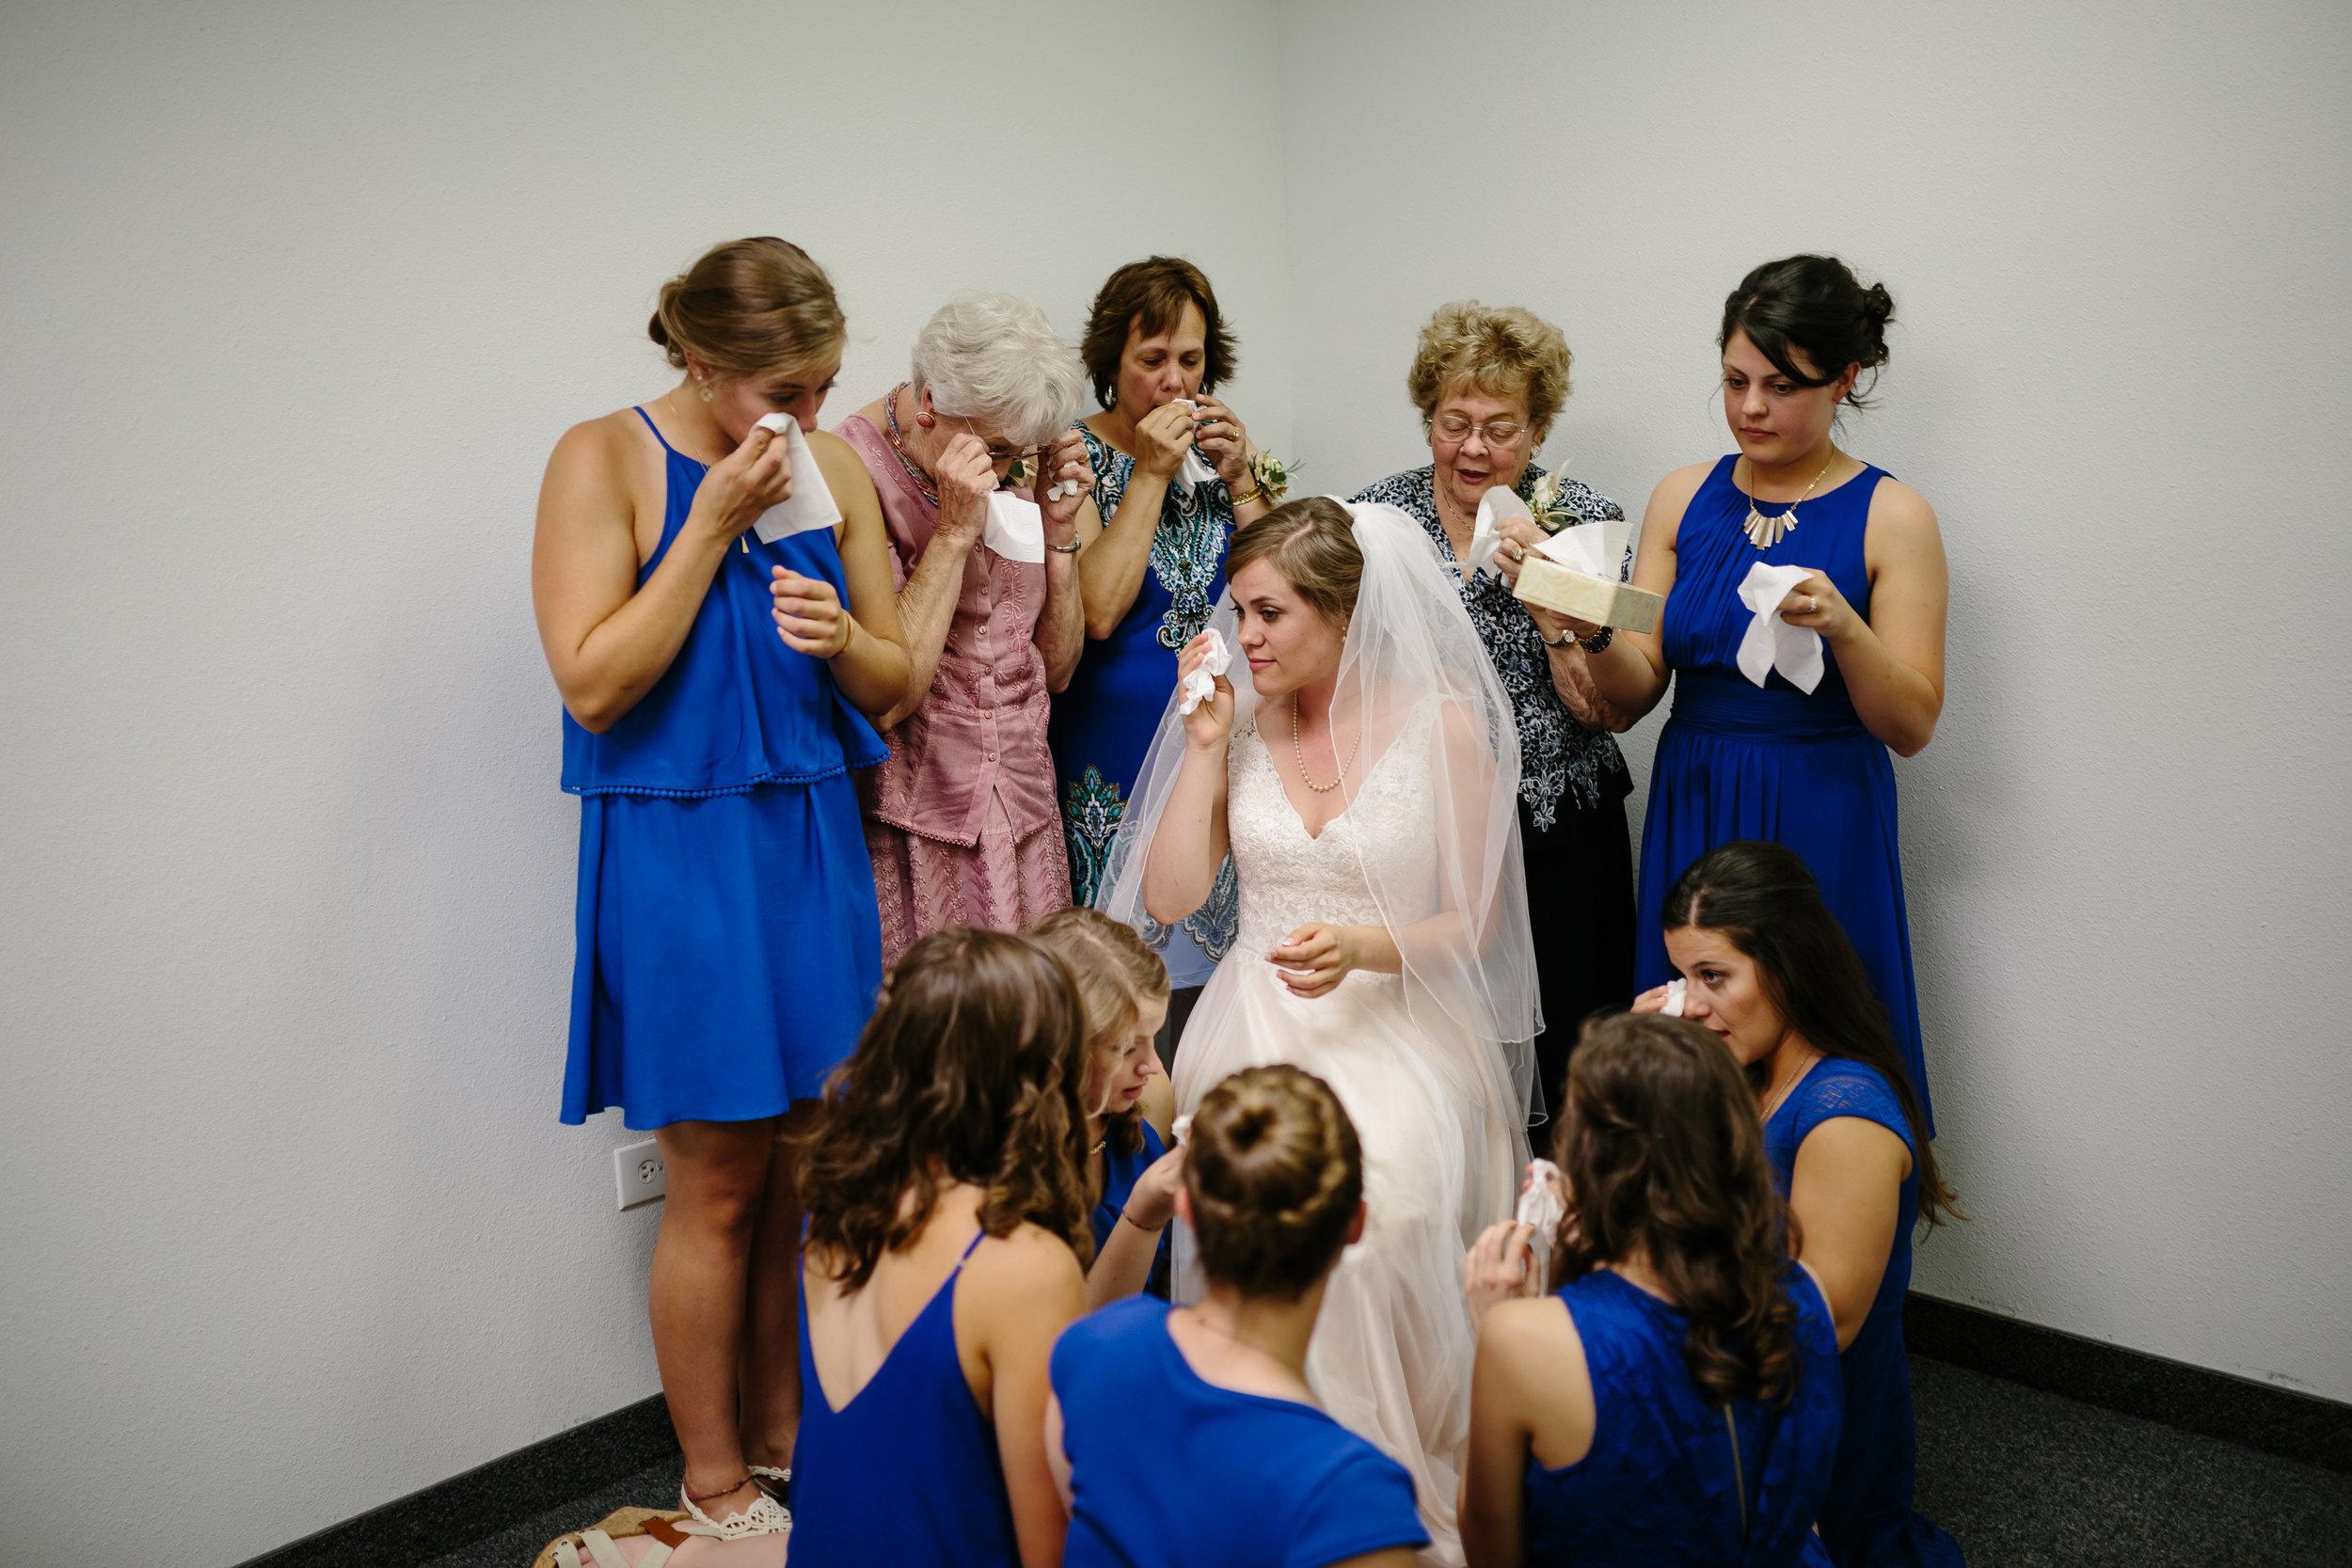 Jordan & Shantel Married - Idaho - Corrie Mick Photography-64.jpg